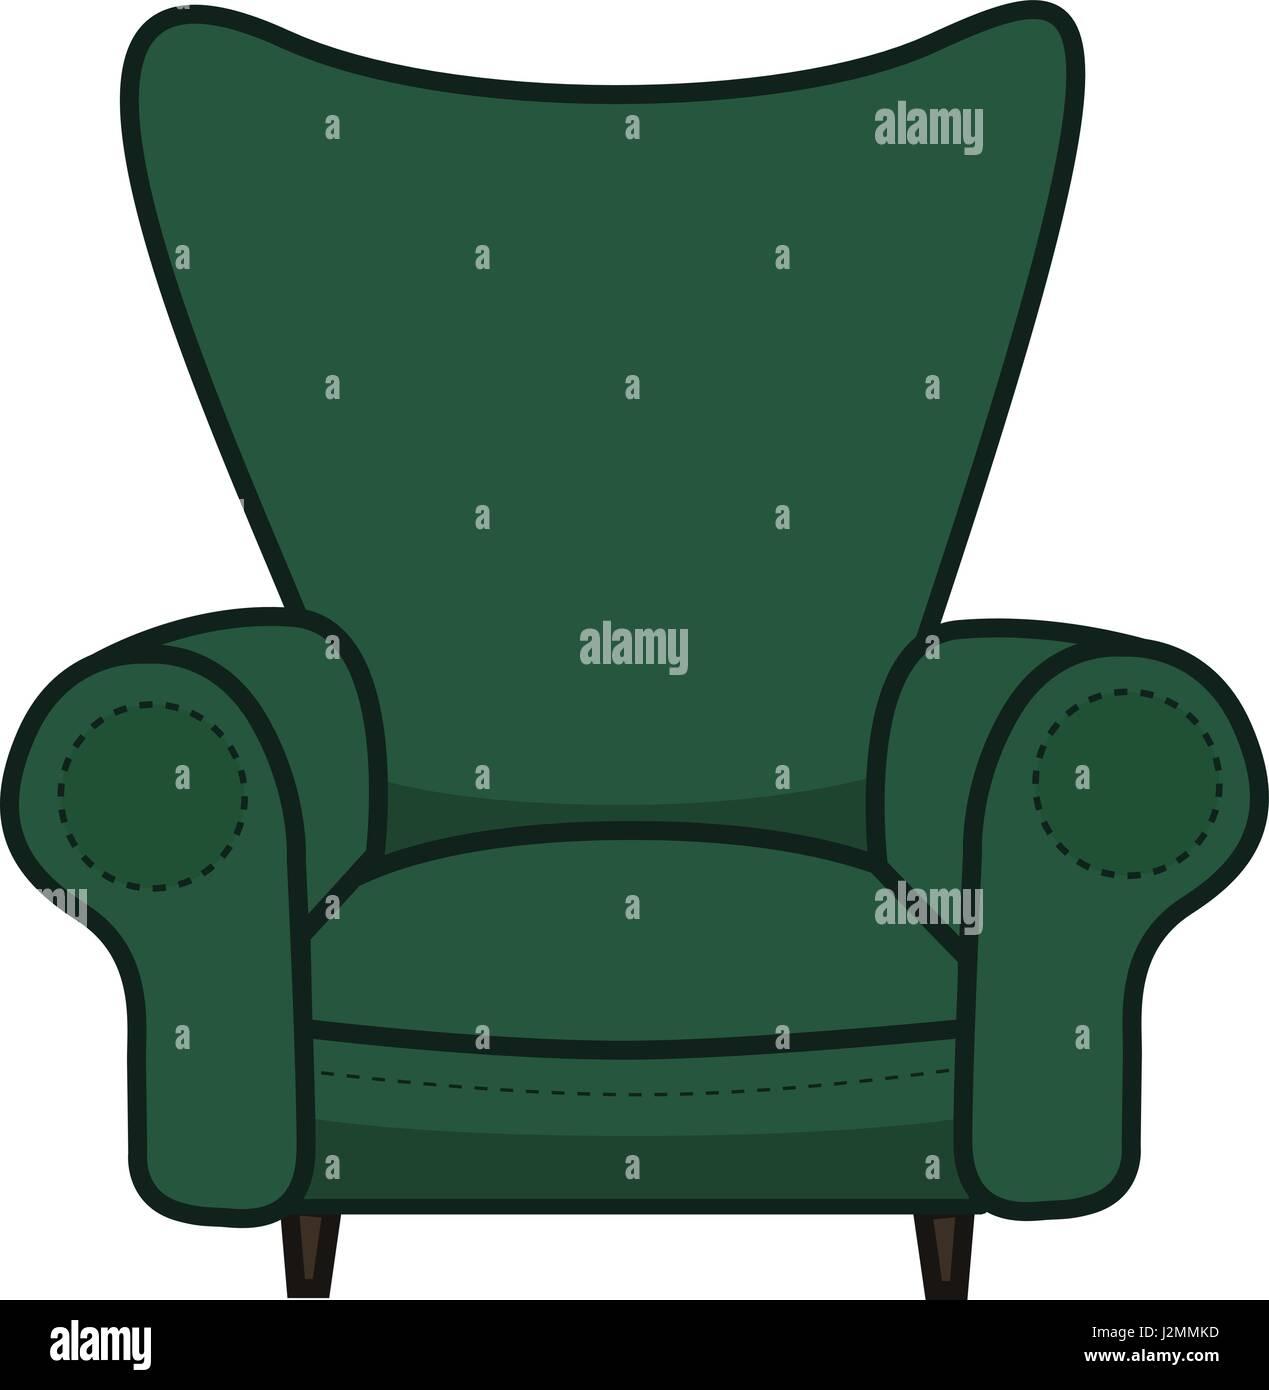 Animated Cartoon Armchair In Minimalist Vector Isolated On